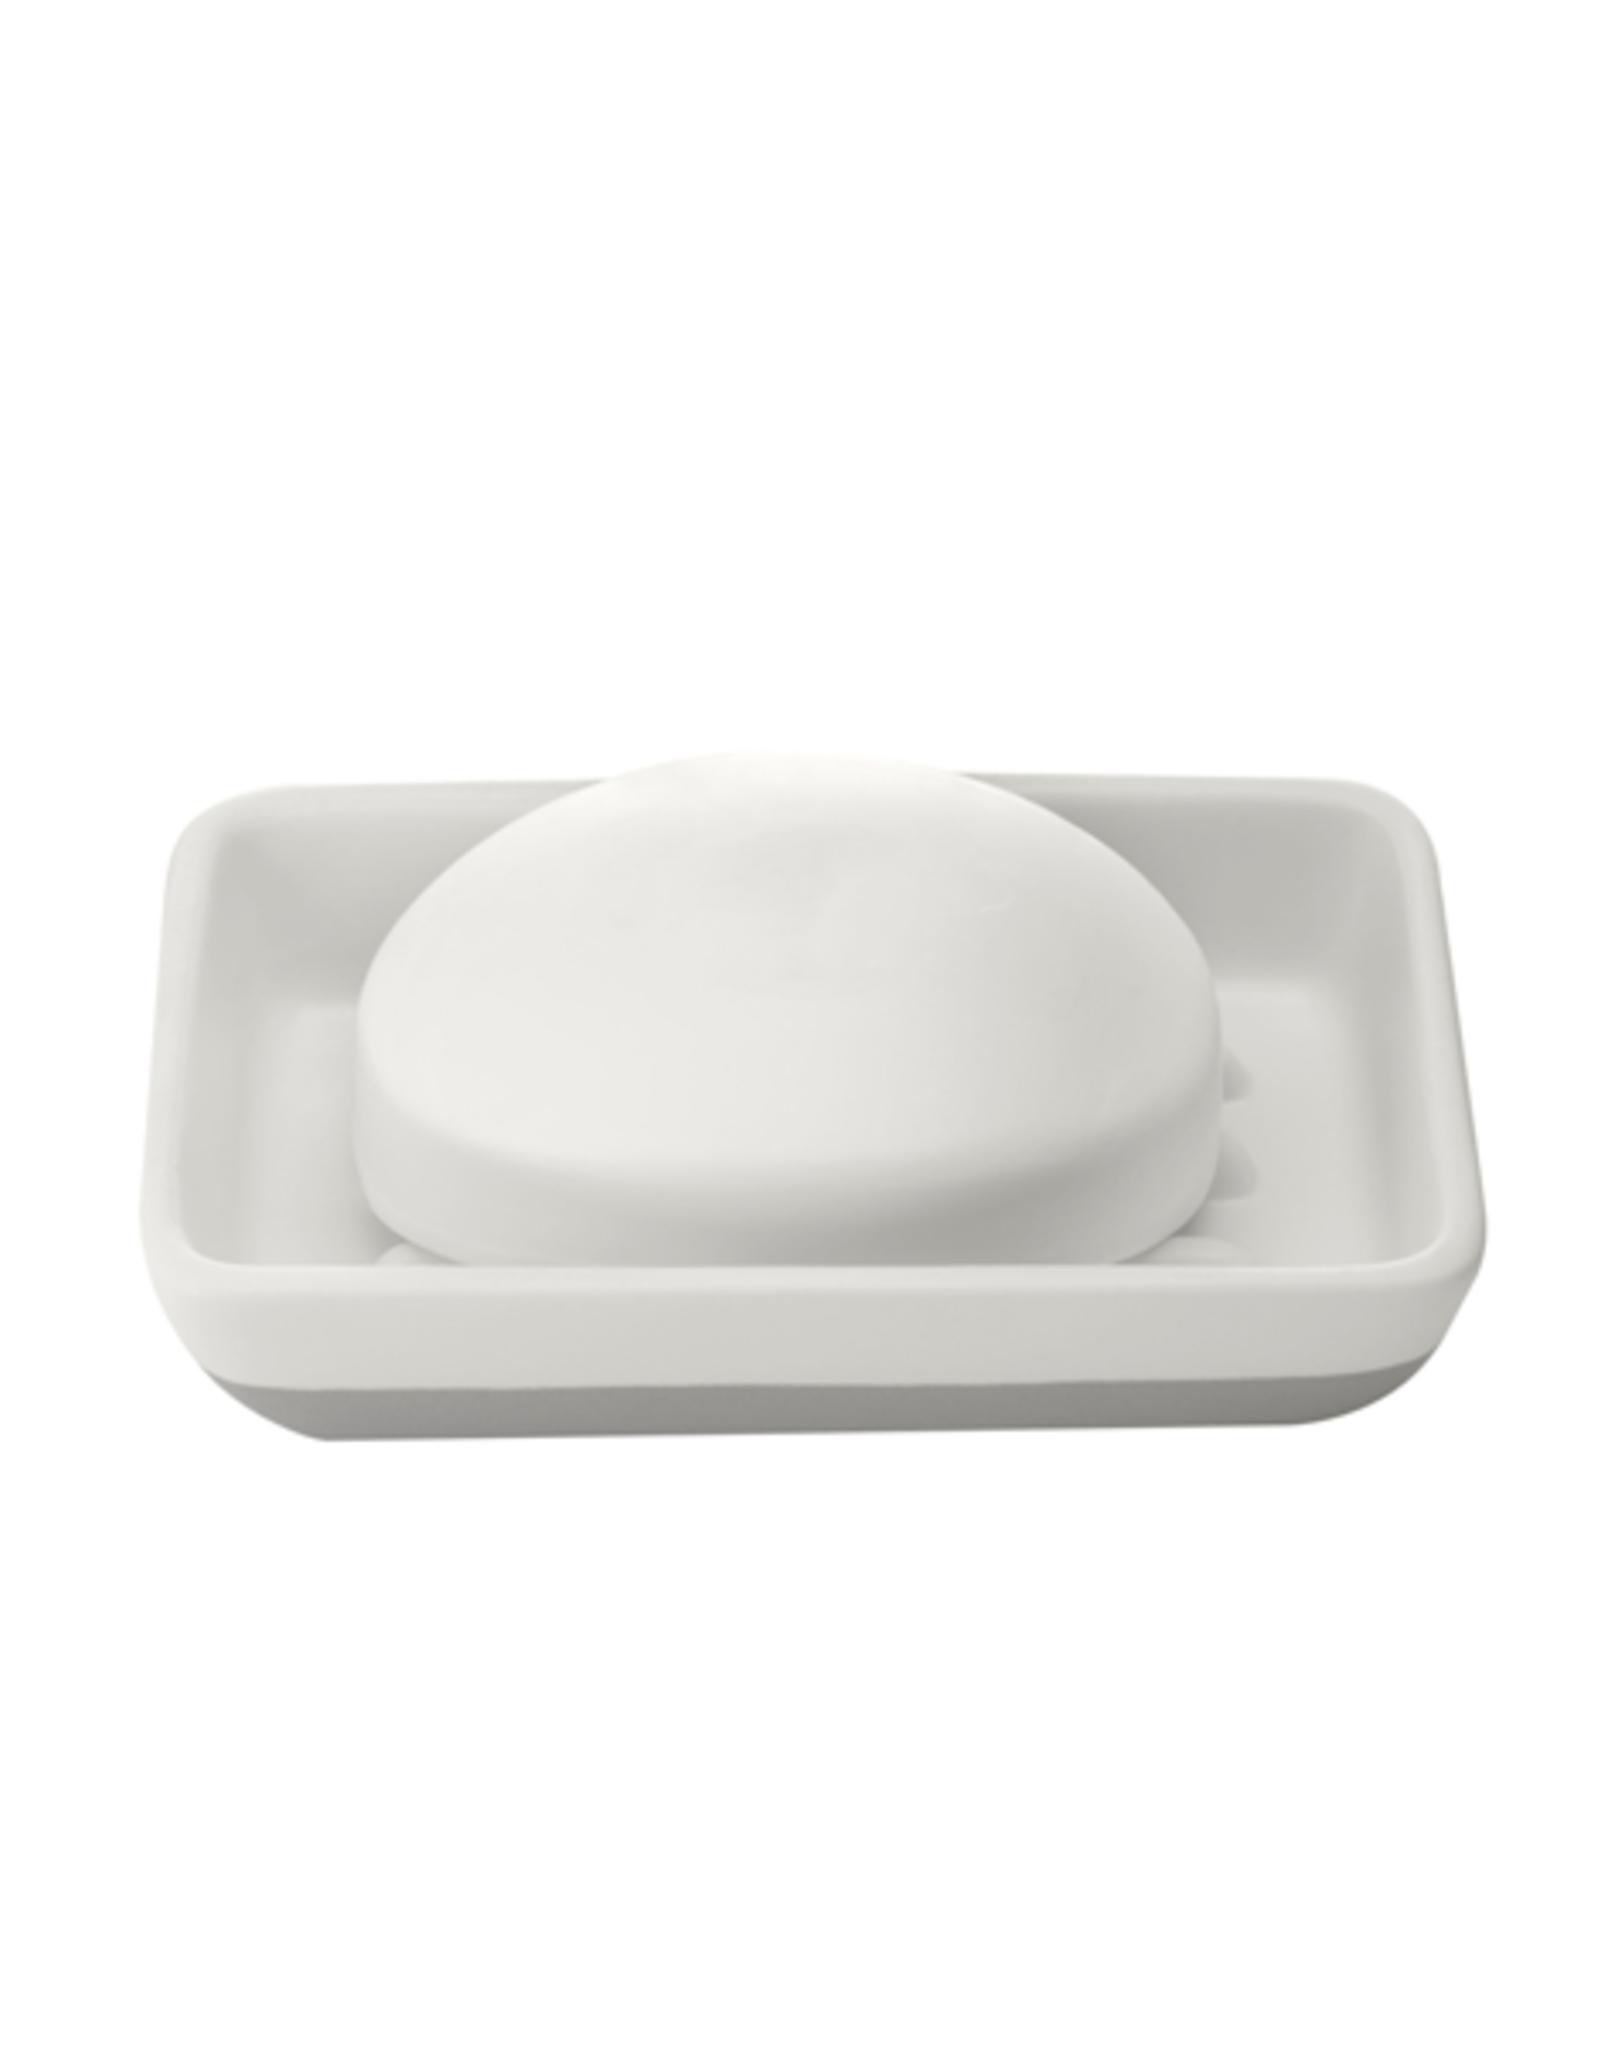 DCO - Soap Dish/Raised, White